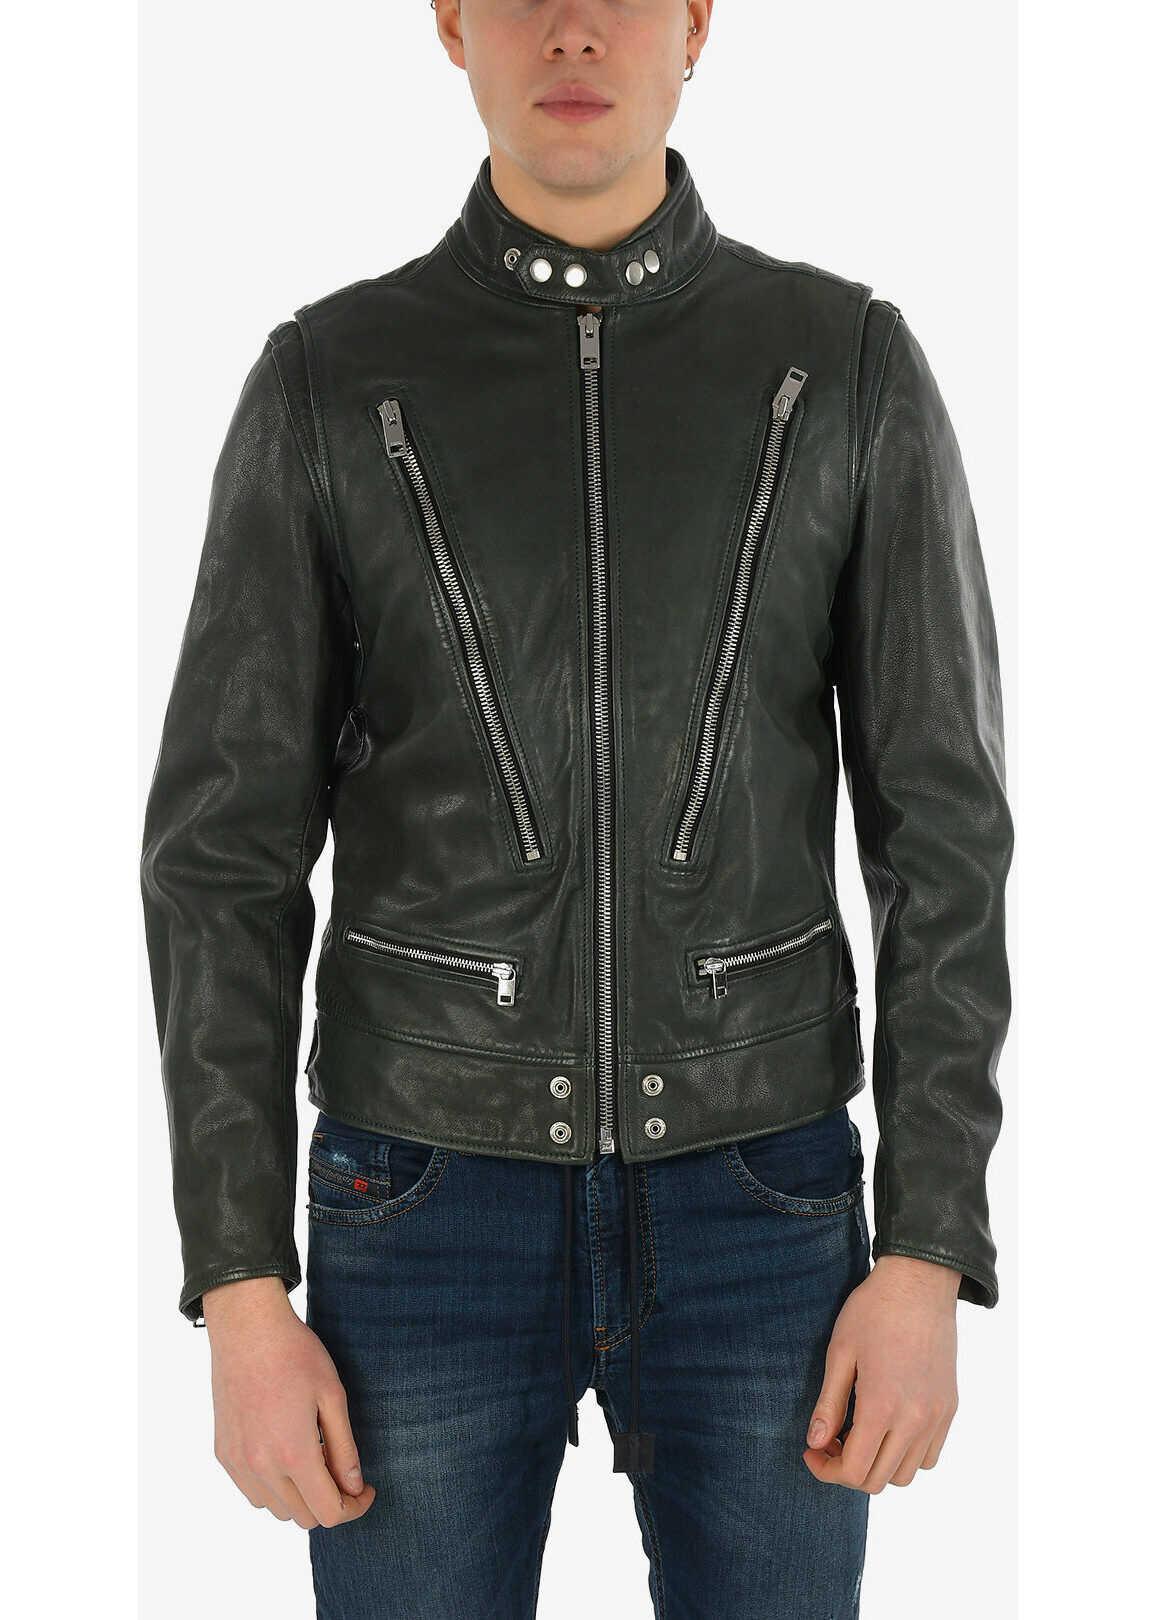 Diesel Leather L-KOJI Jacket with Zip Closure GREEN imagine